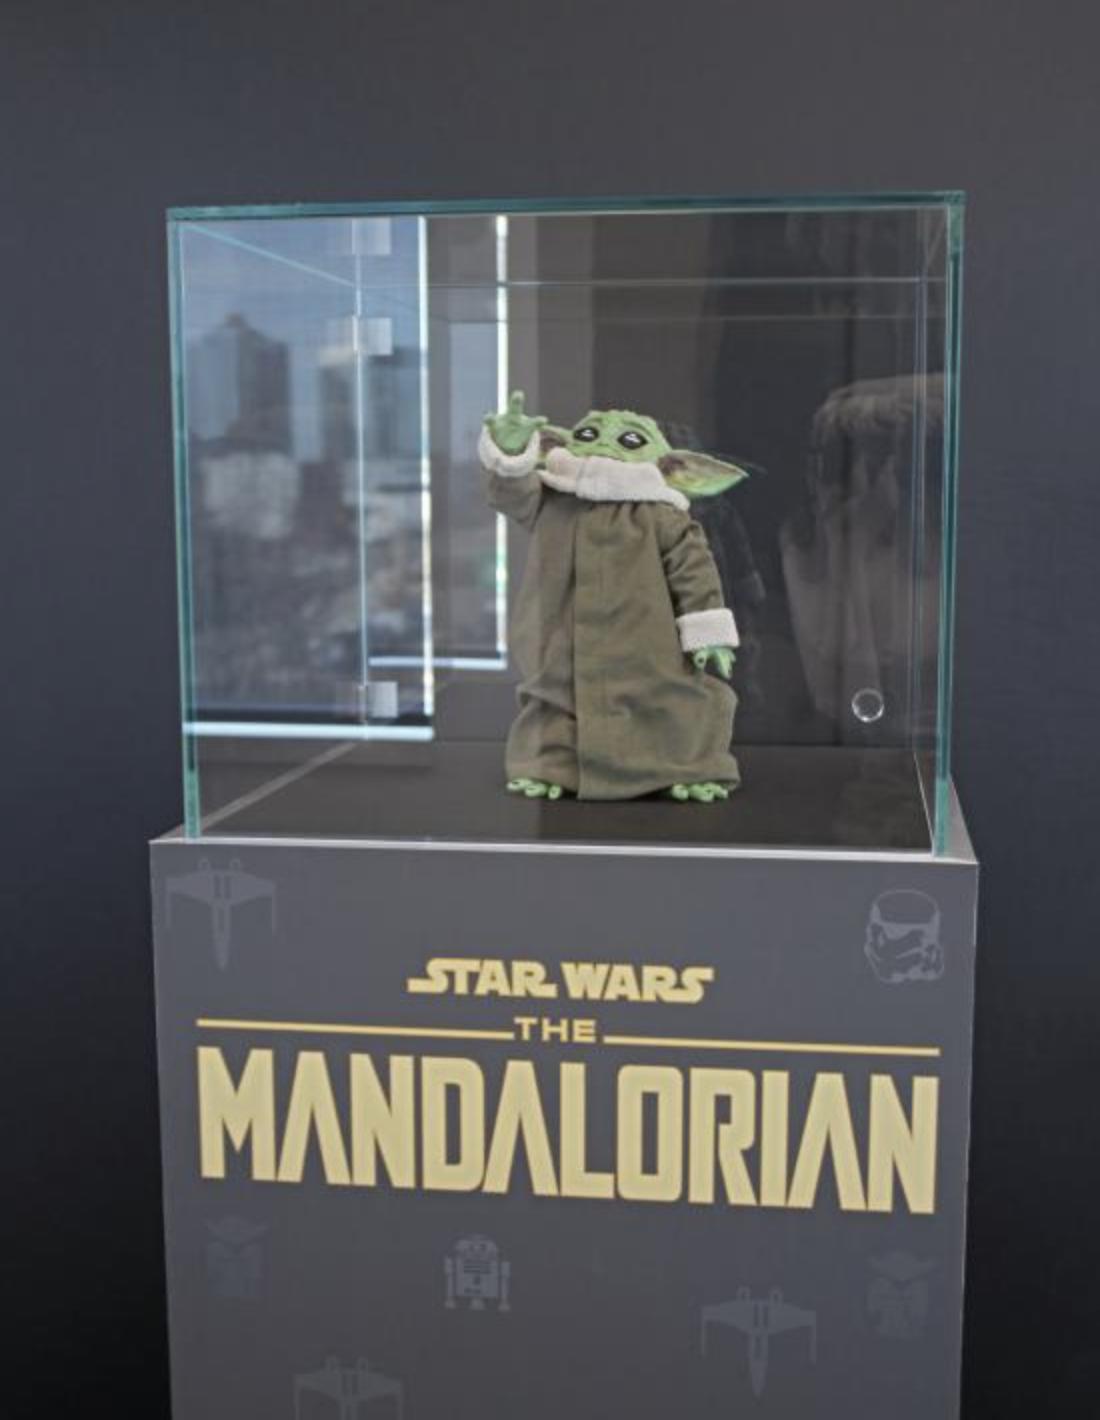 The Mandalorian - Baby Yoda | Sheridan College<br/><i>Anastasiia Kravchuk</i>